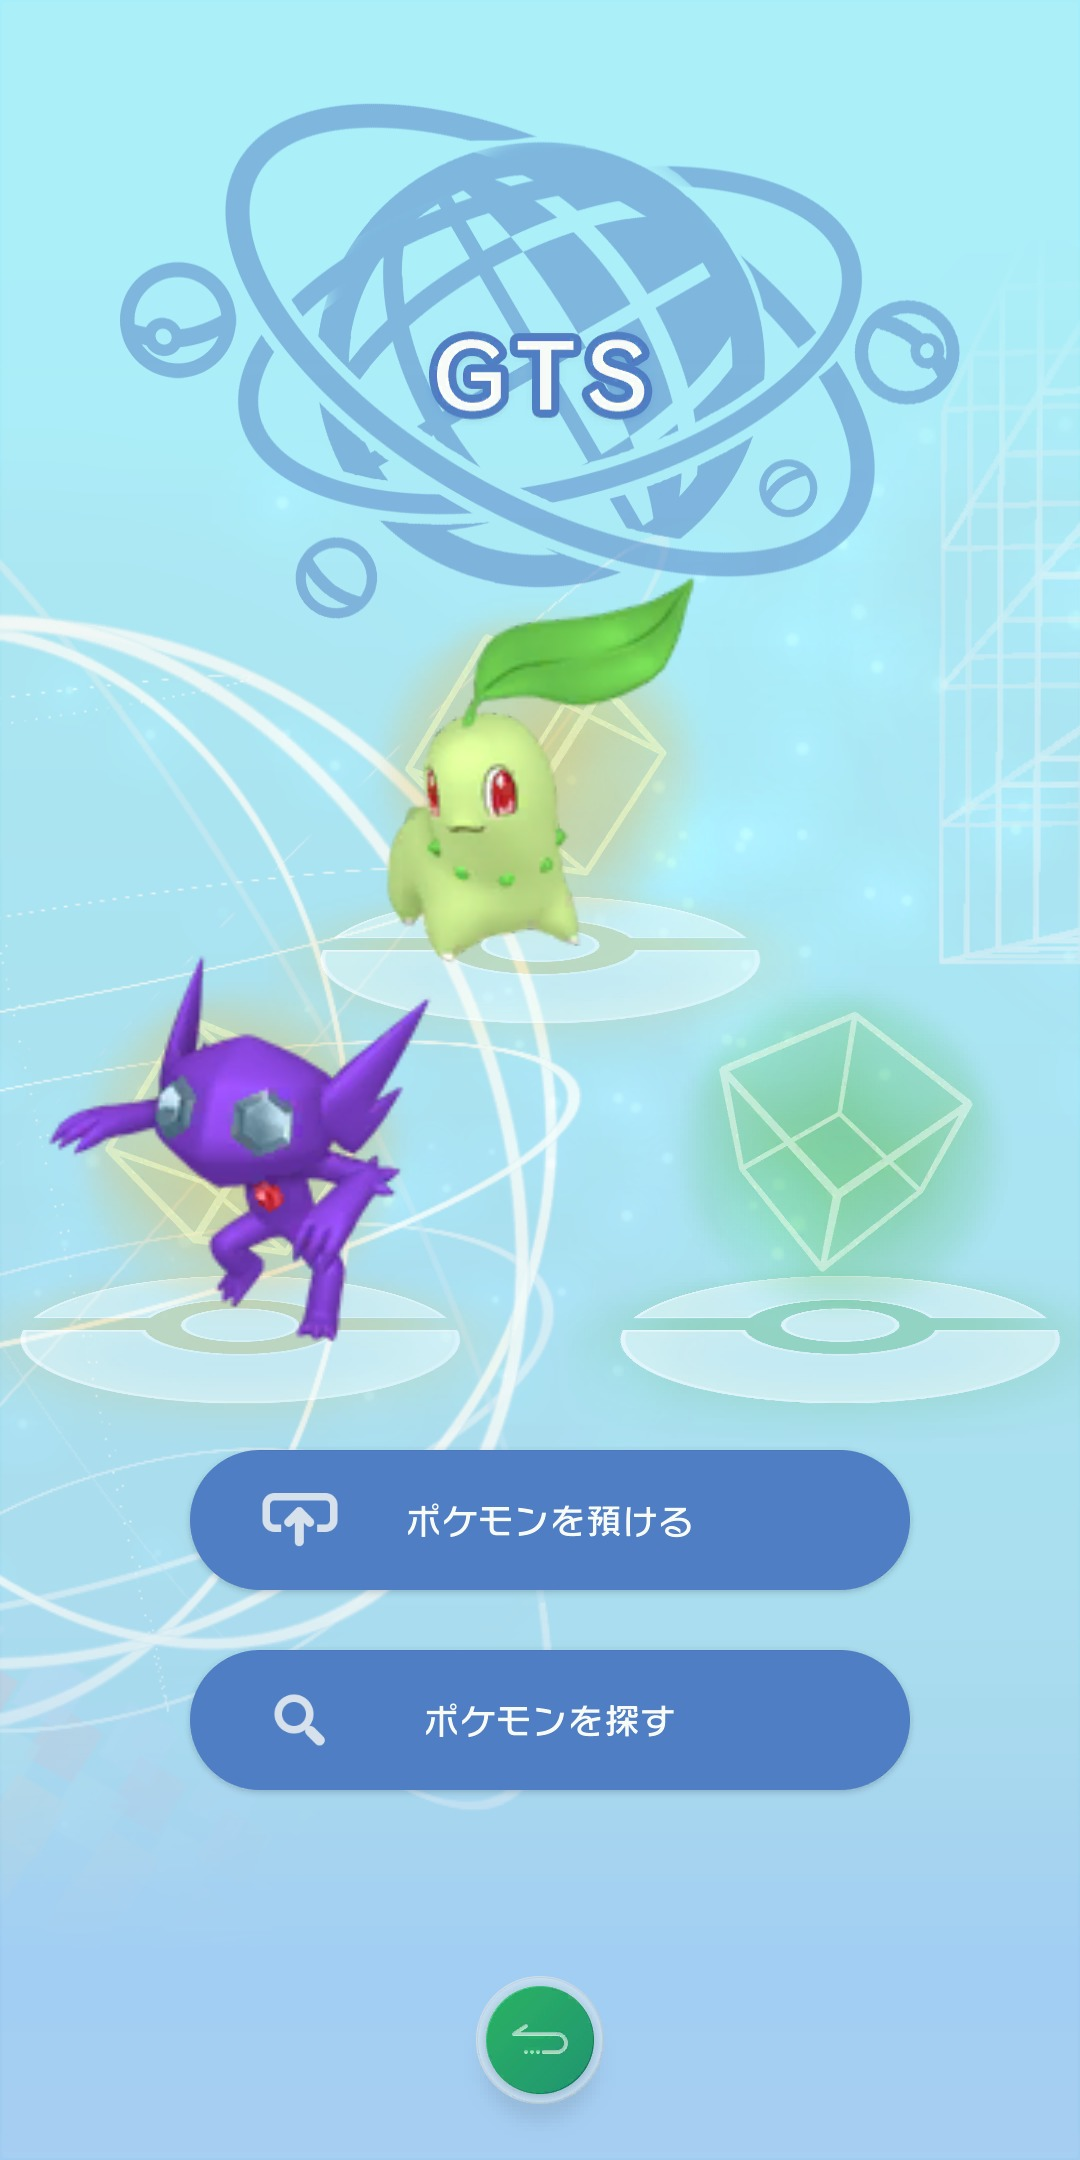 GTS1 (C)2020 Pokémon. (C)1995-2020 Nintendo/Creatures Inc. /GAME FREAK inc.